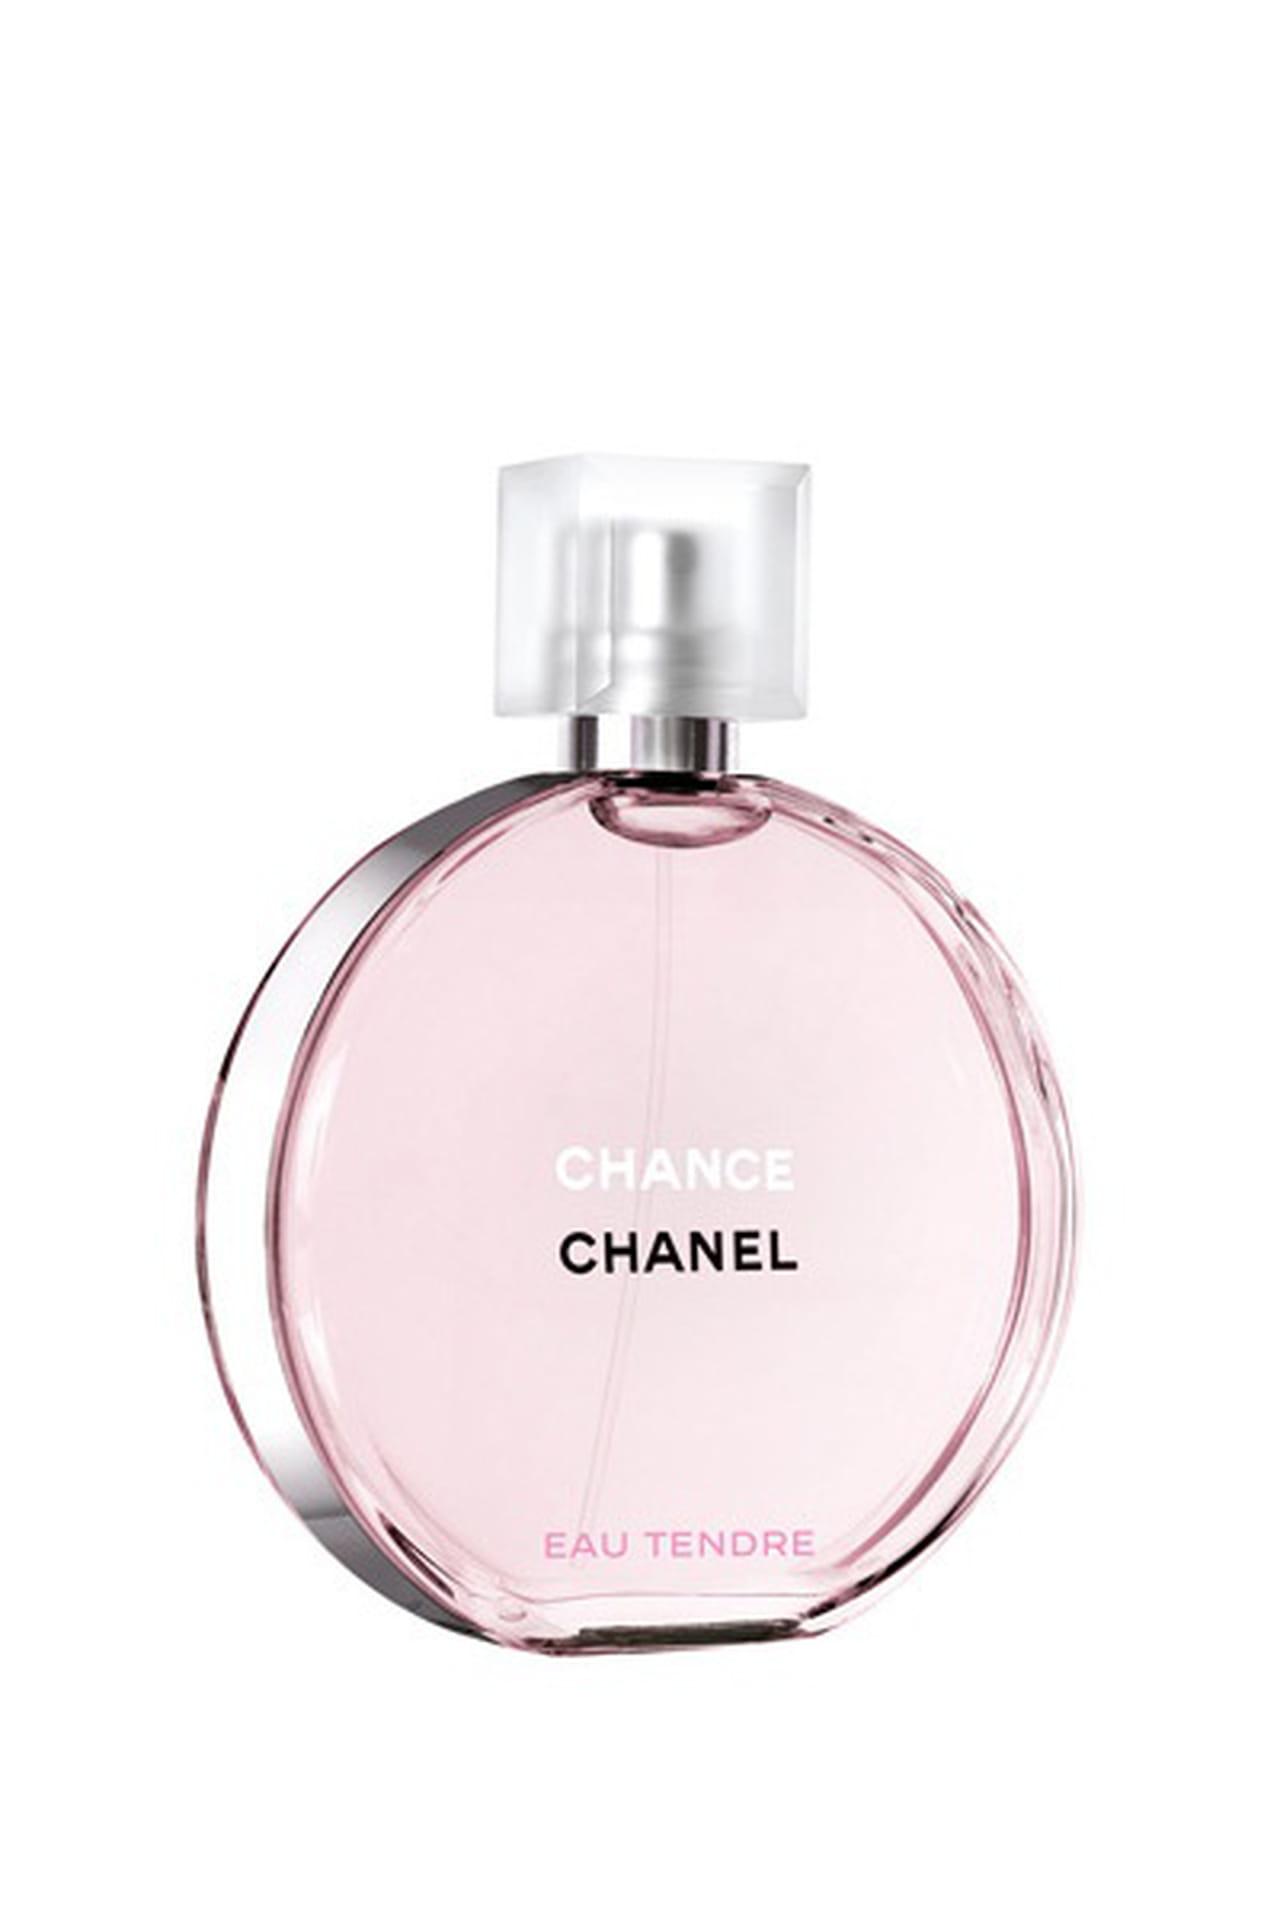 e982d578a مجموعة Chanel Chance بأحجام جديدة للعام الجديد